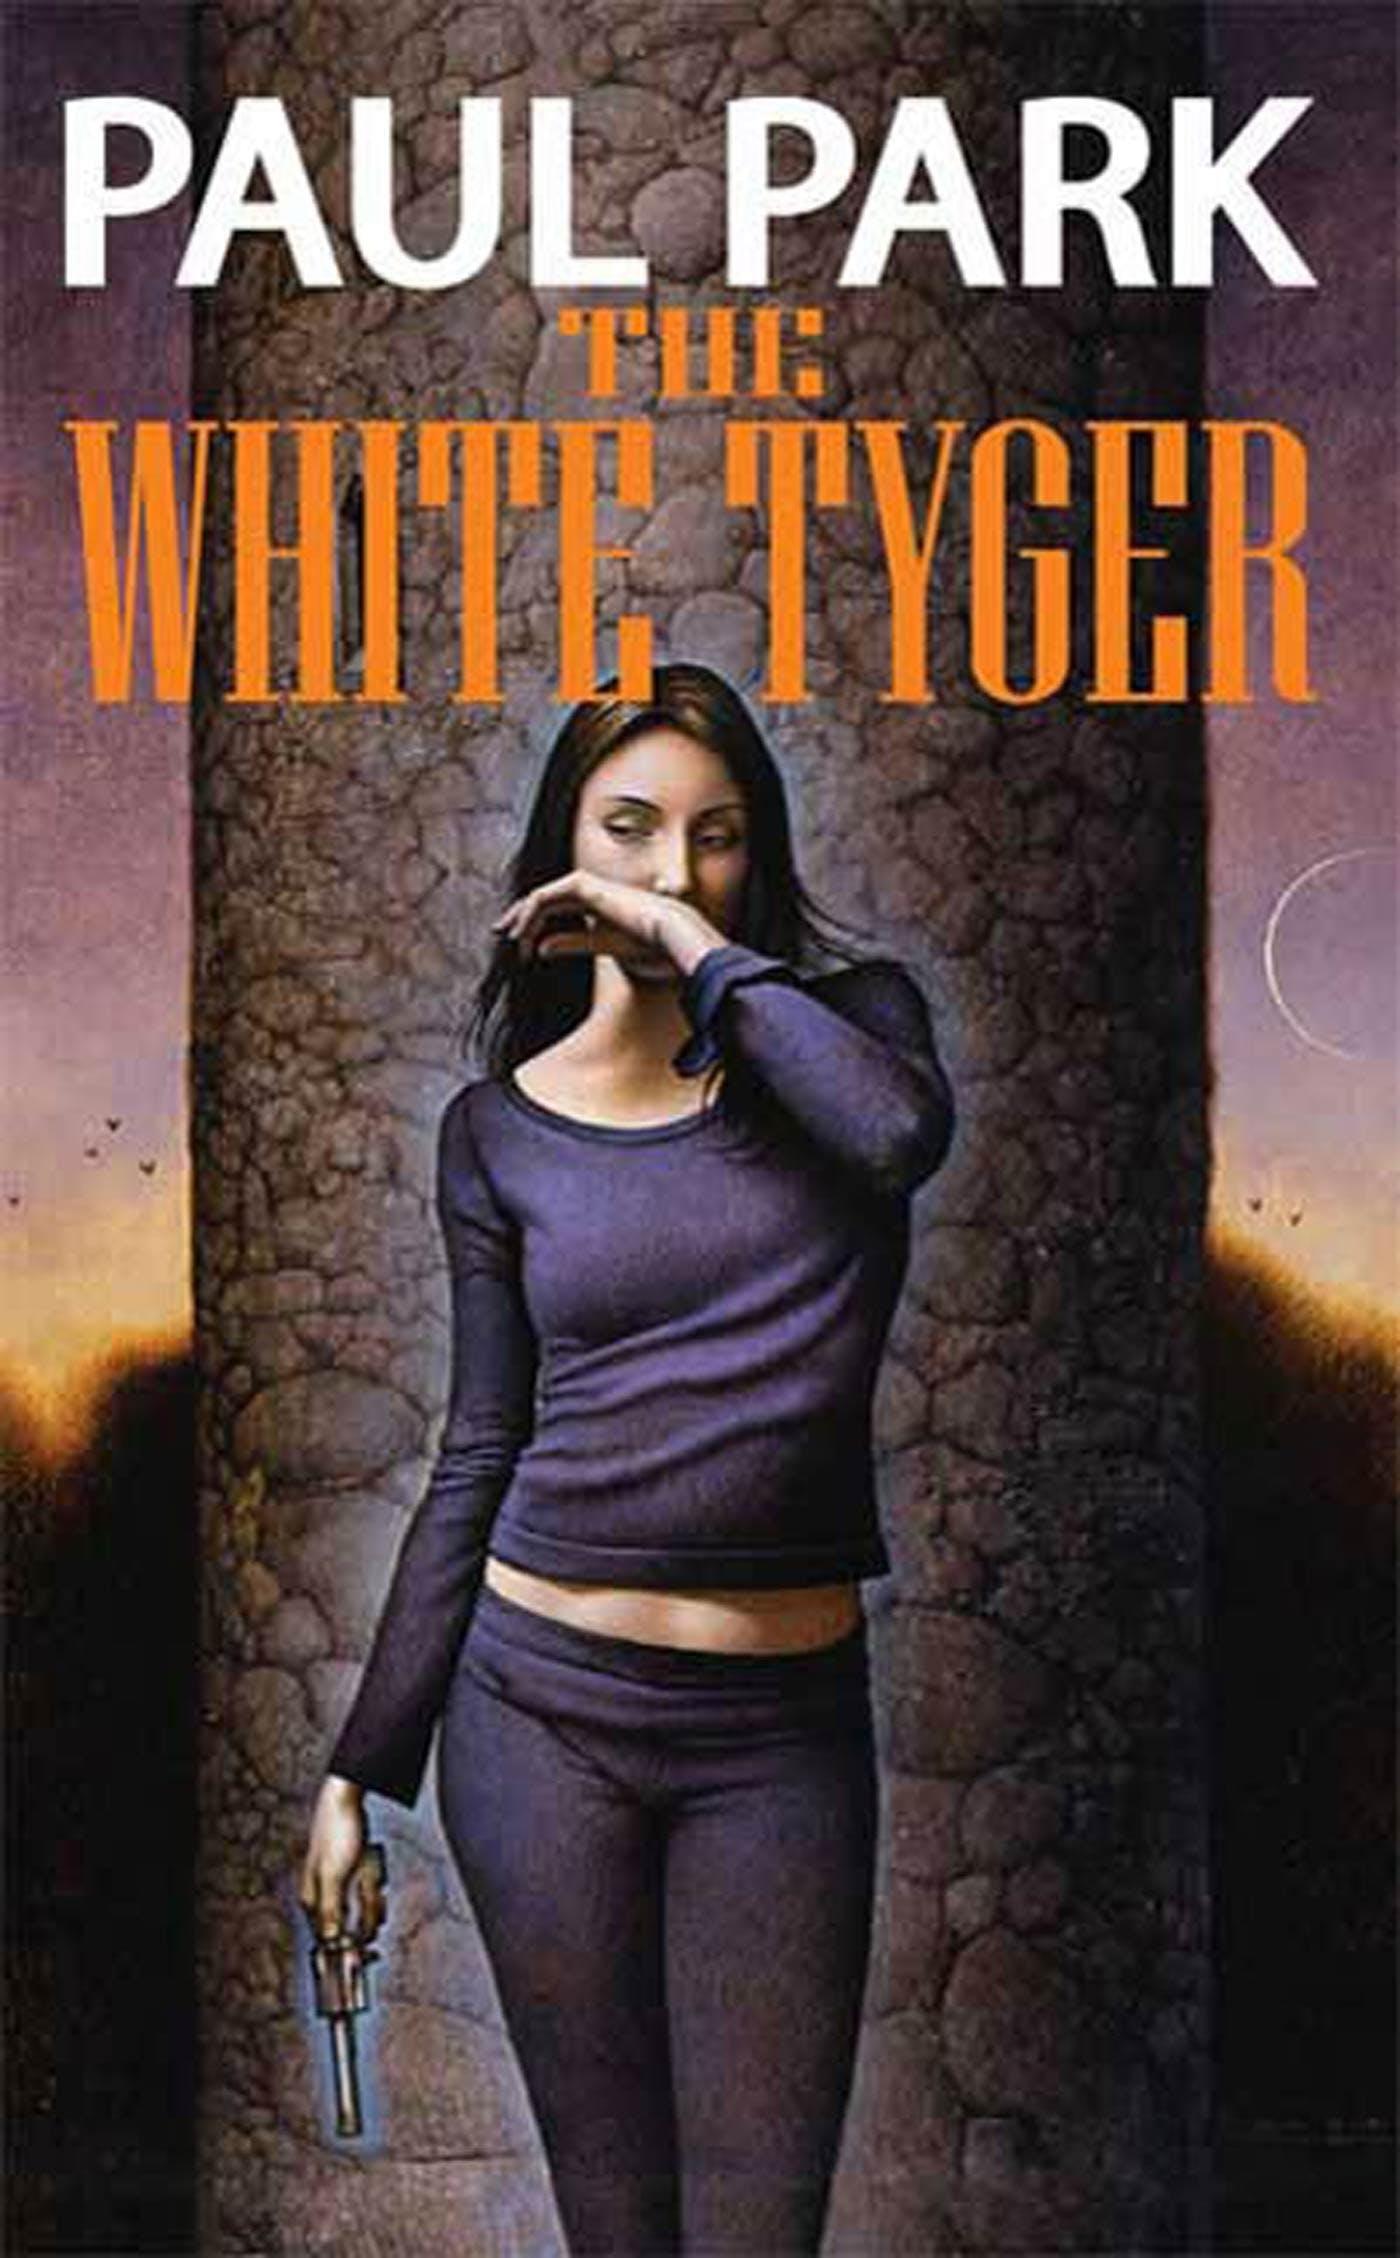 Image of The White Tyger